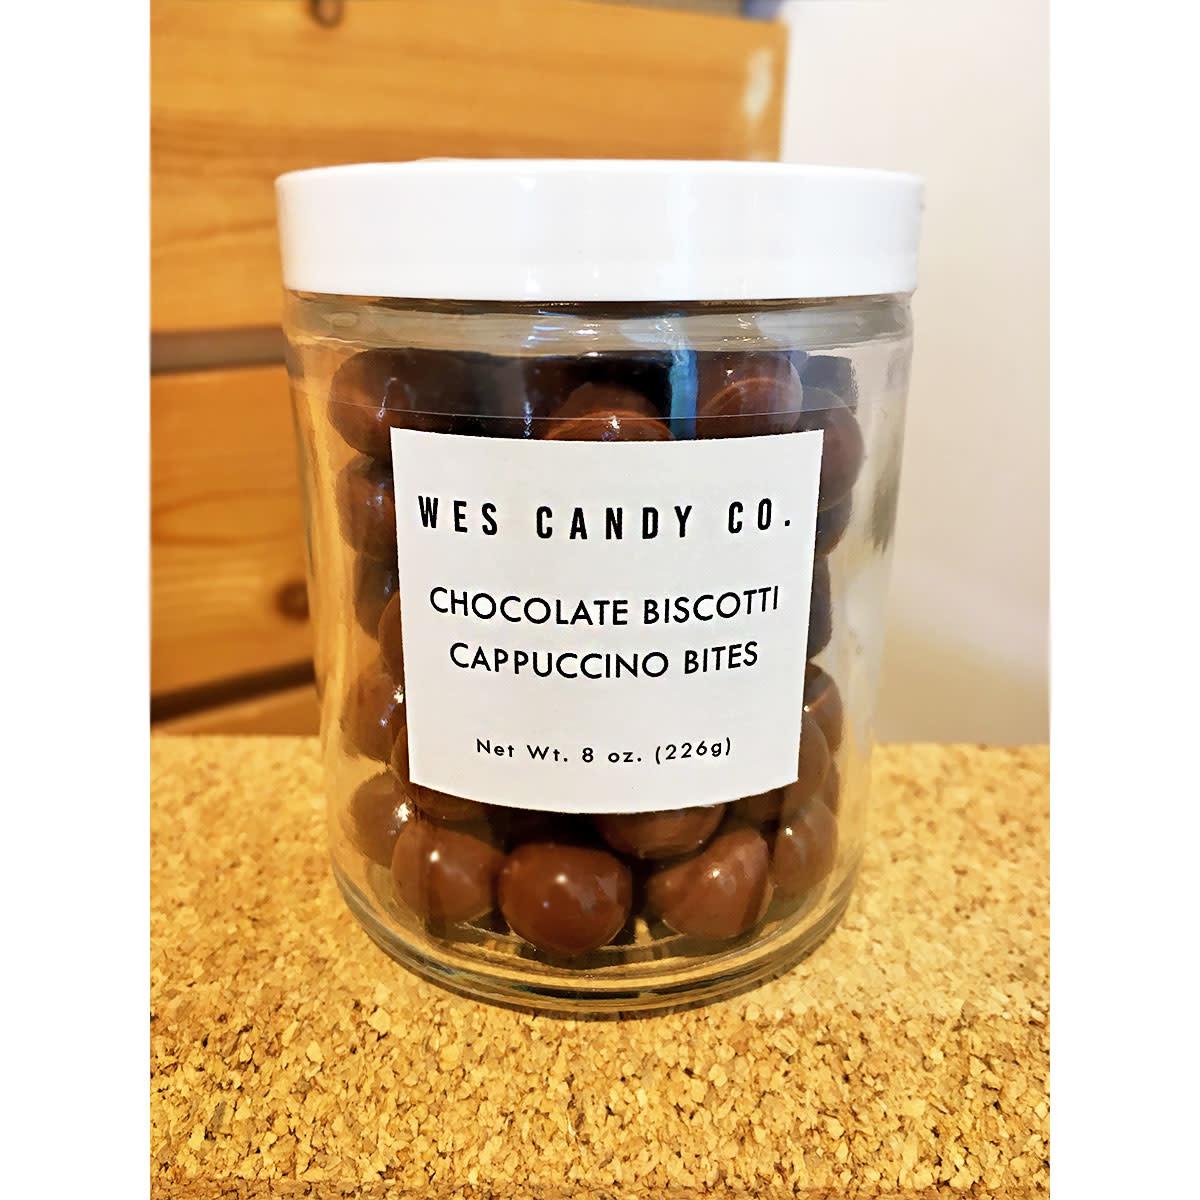 Wes Candy Co. Milk Chocolate Cappuccino Biscotti Bites Jar